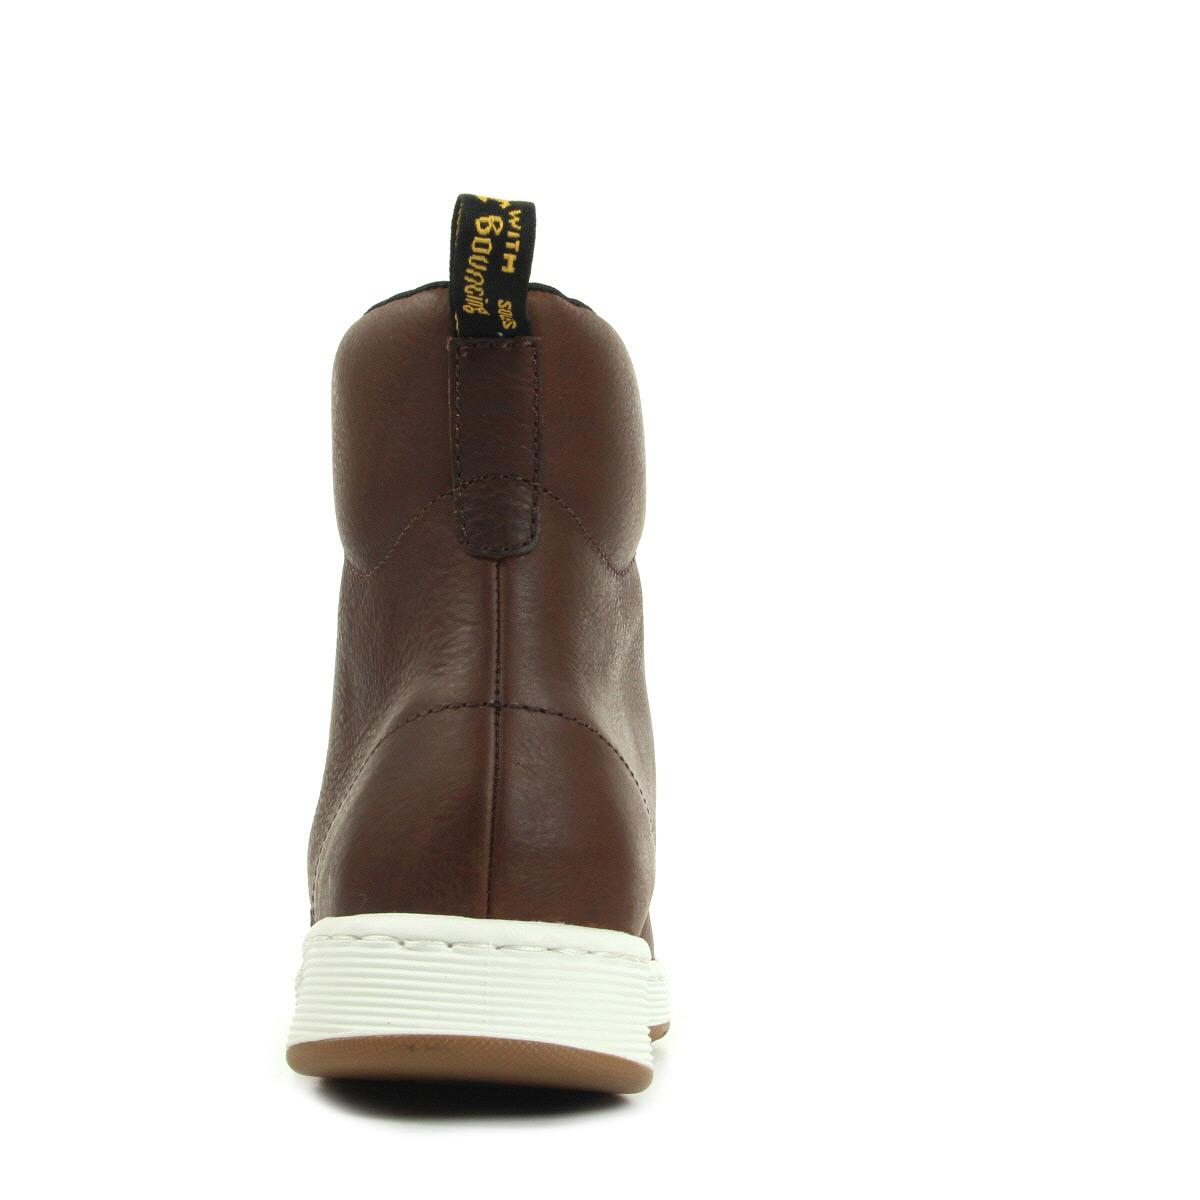 Dr. Martens Rigal Tan Carpathian Tan Sandwich 21860220, Boots